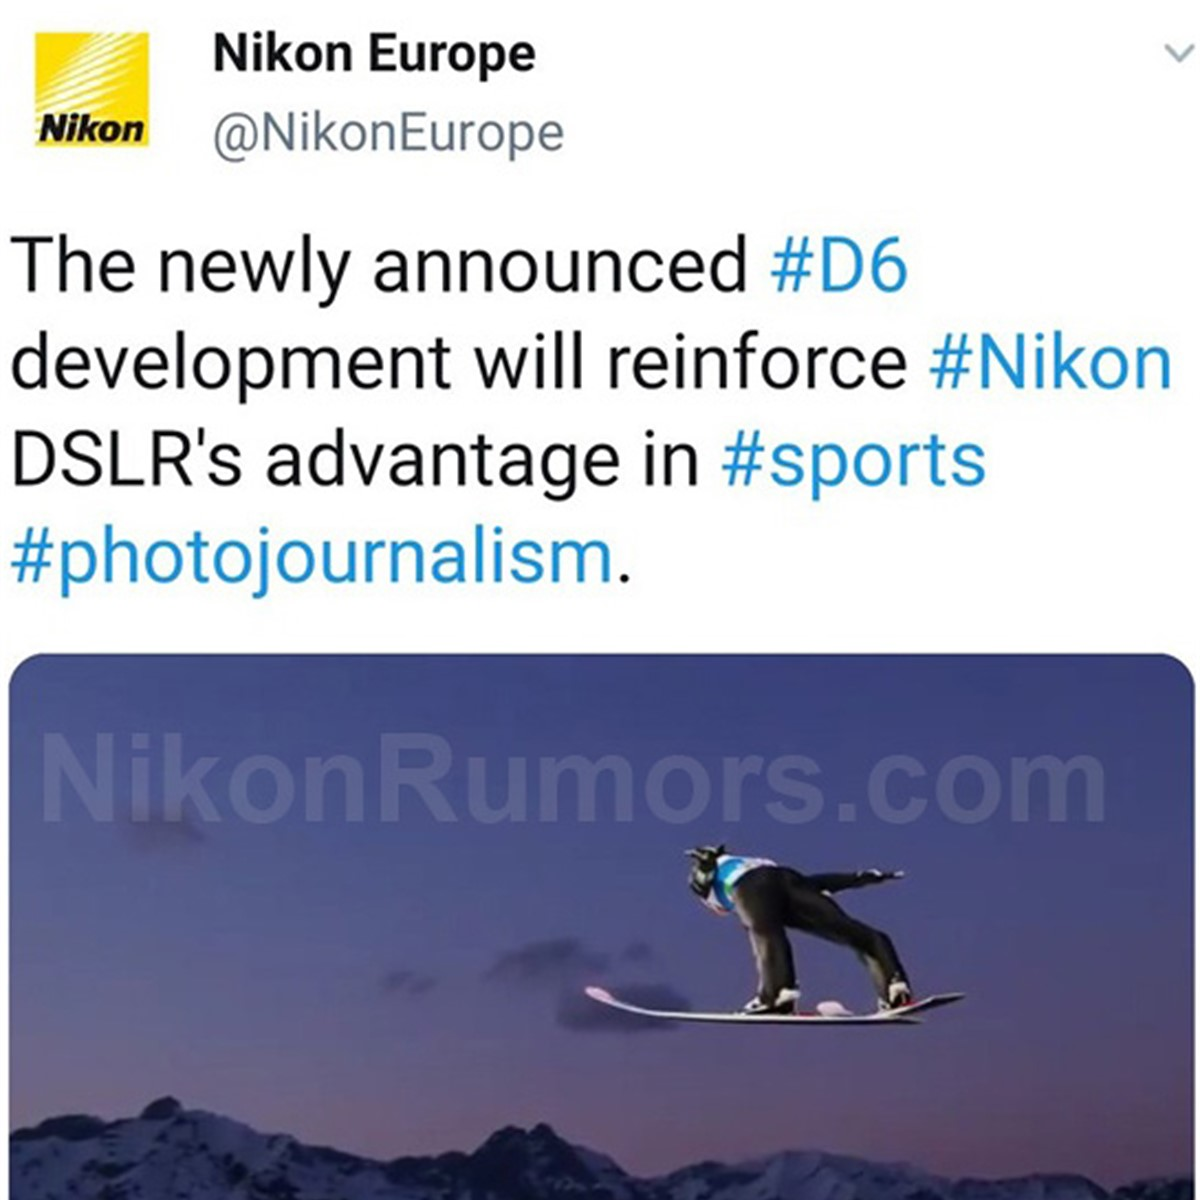 Nikon shares D6 development teasers on social media before